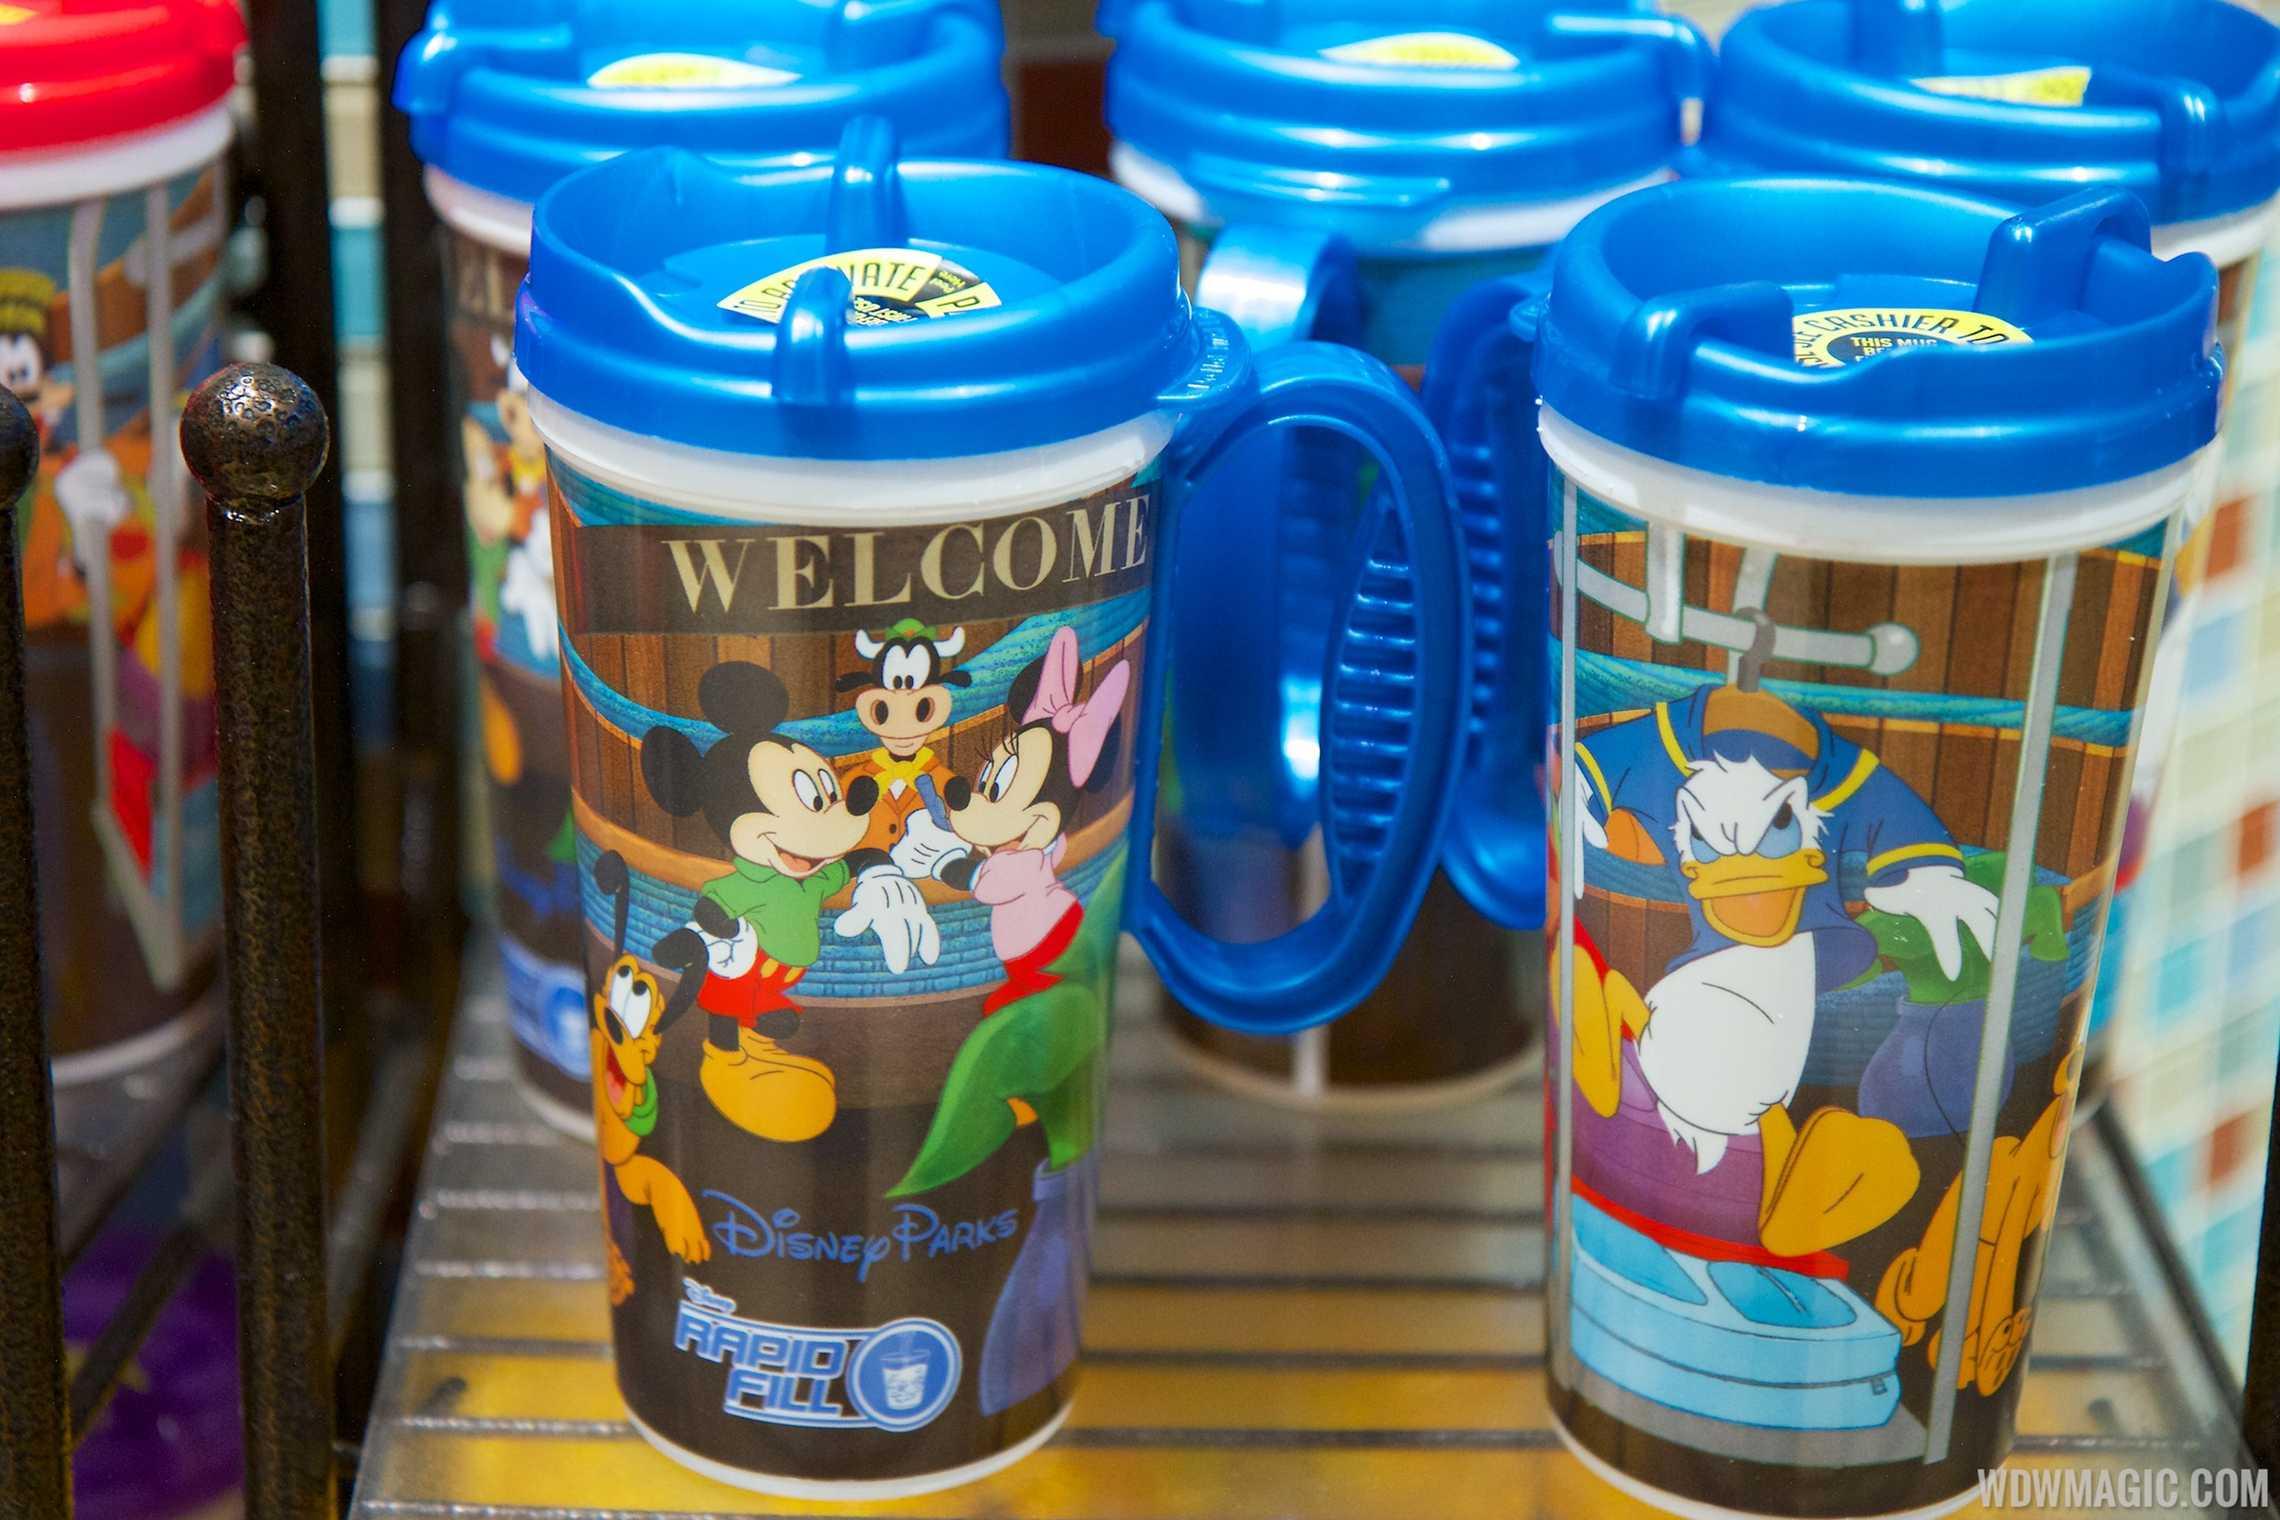 Rapid Fill refillable mugs